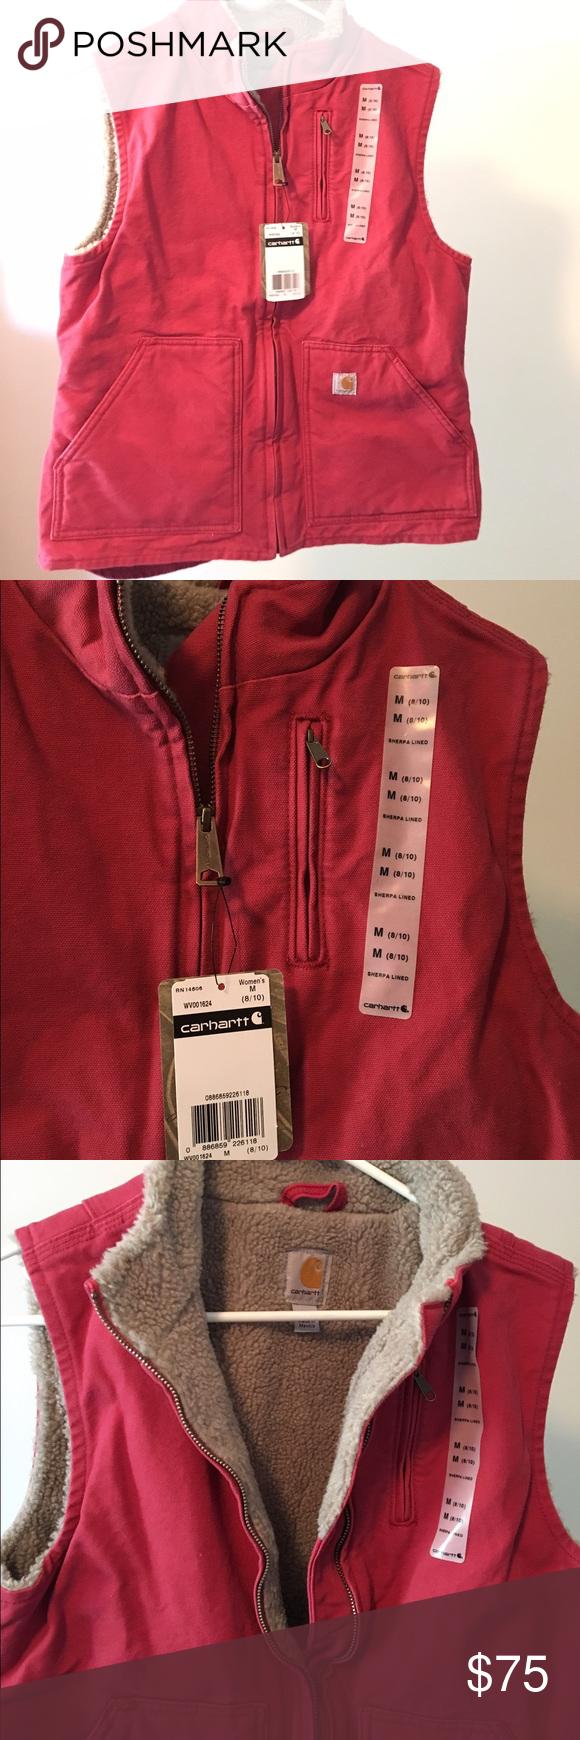 Women's M Carhartt Vest - NWT NWT- never worn SANDSTONE MOCK-NECK VEST/SHERPA-LINED - crab apple Carhartt Jackets & Coats Vests